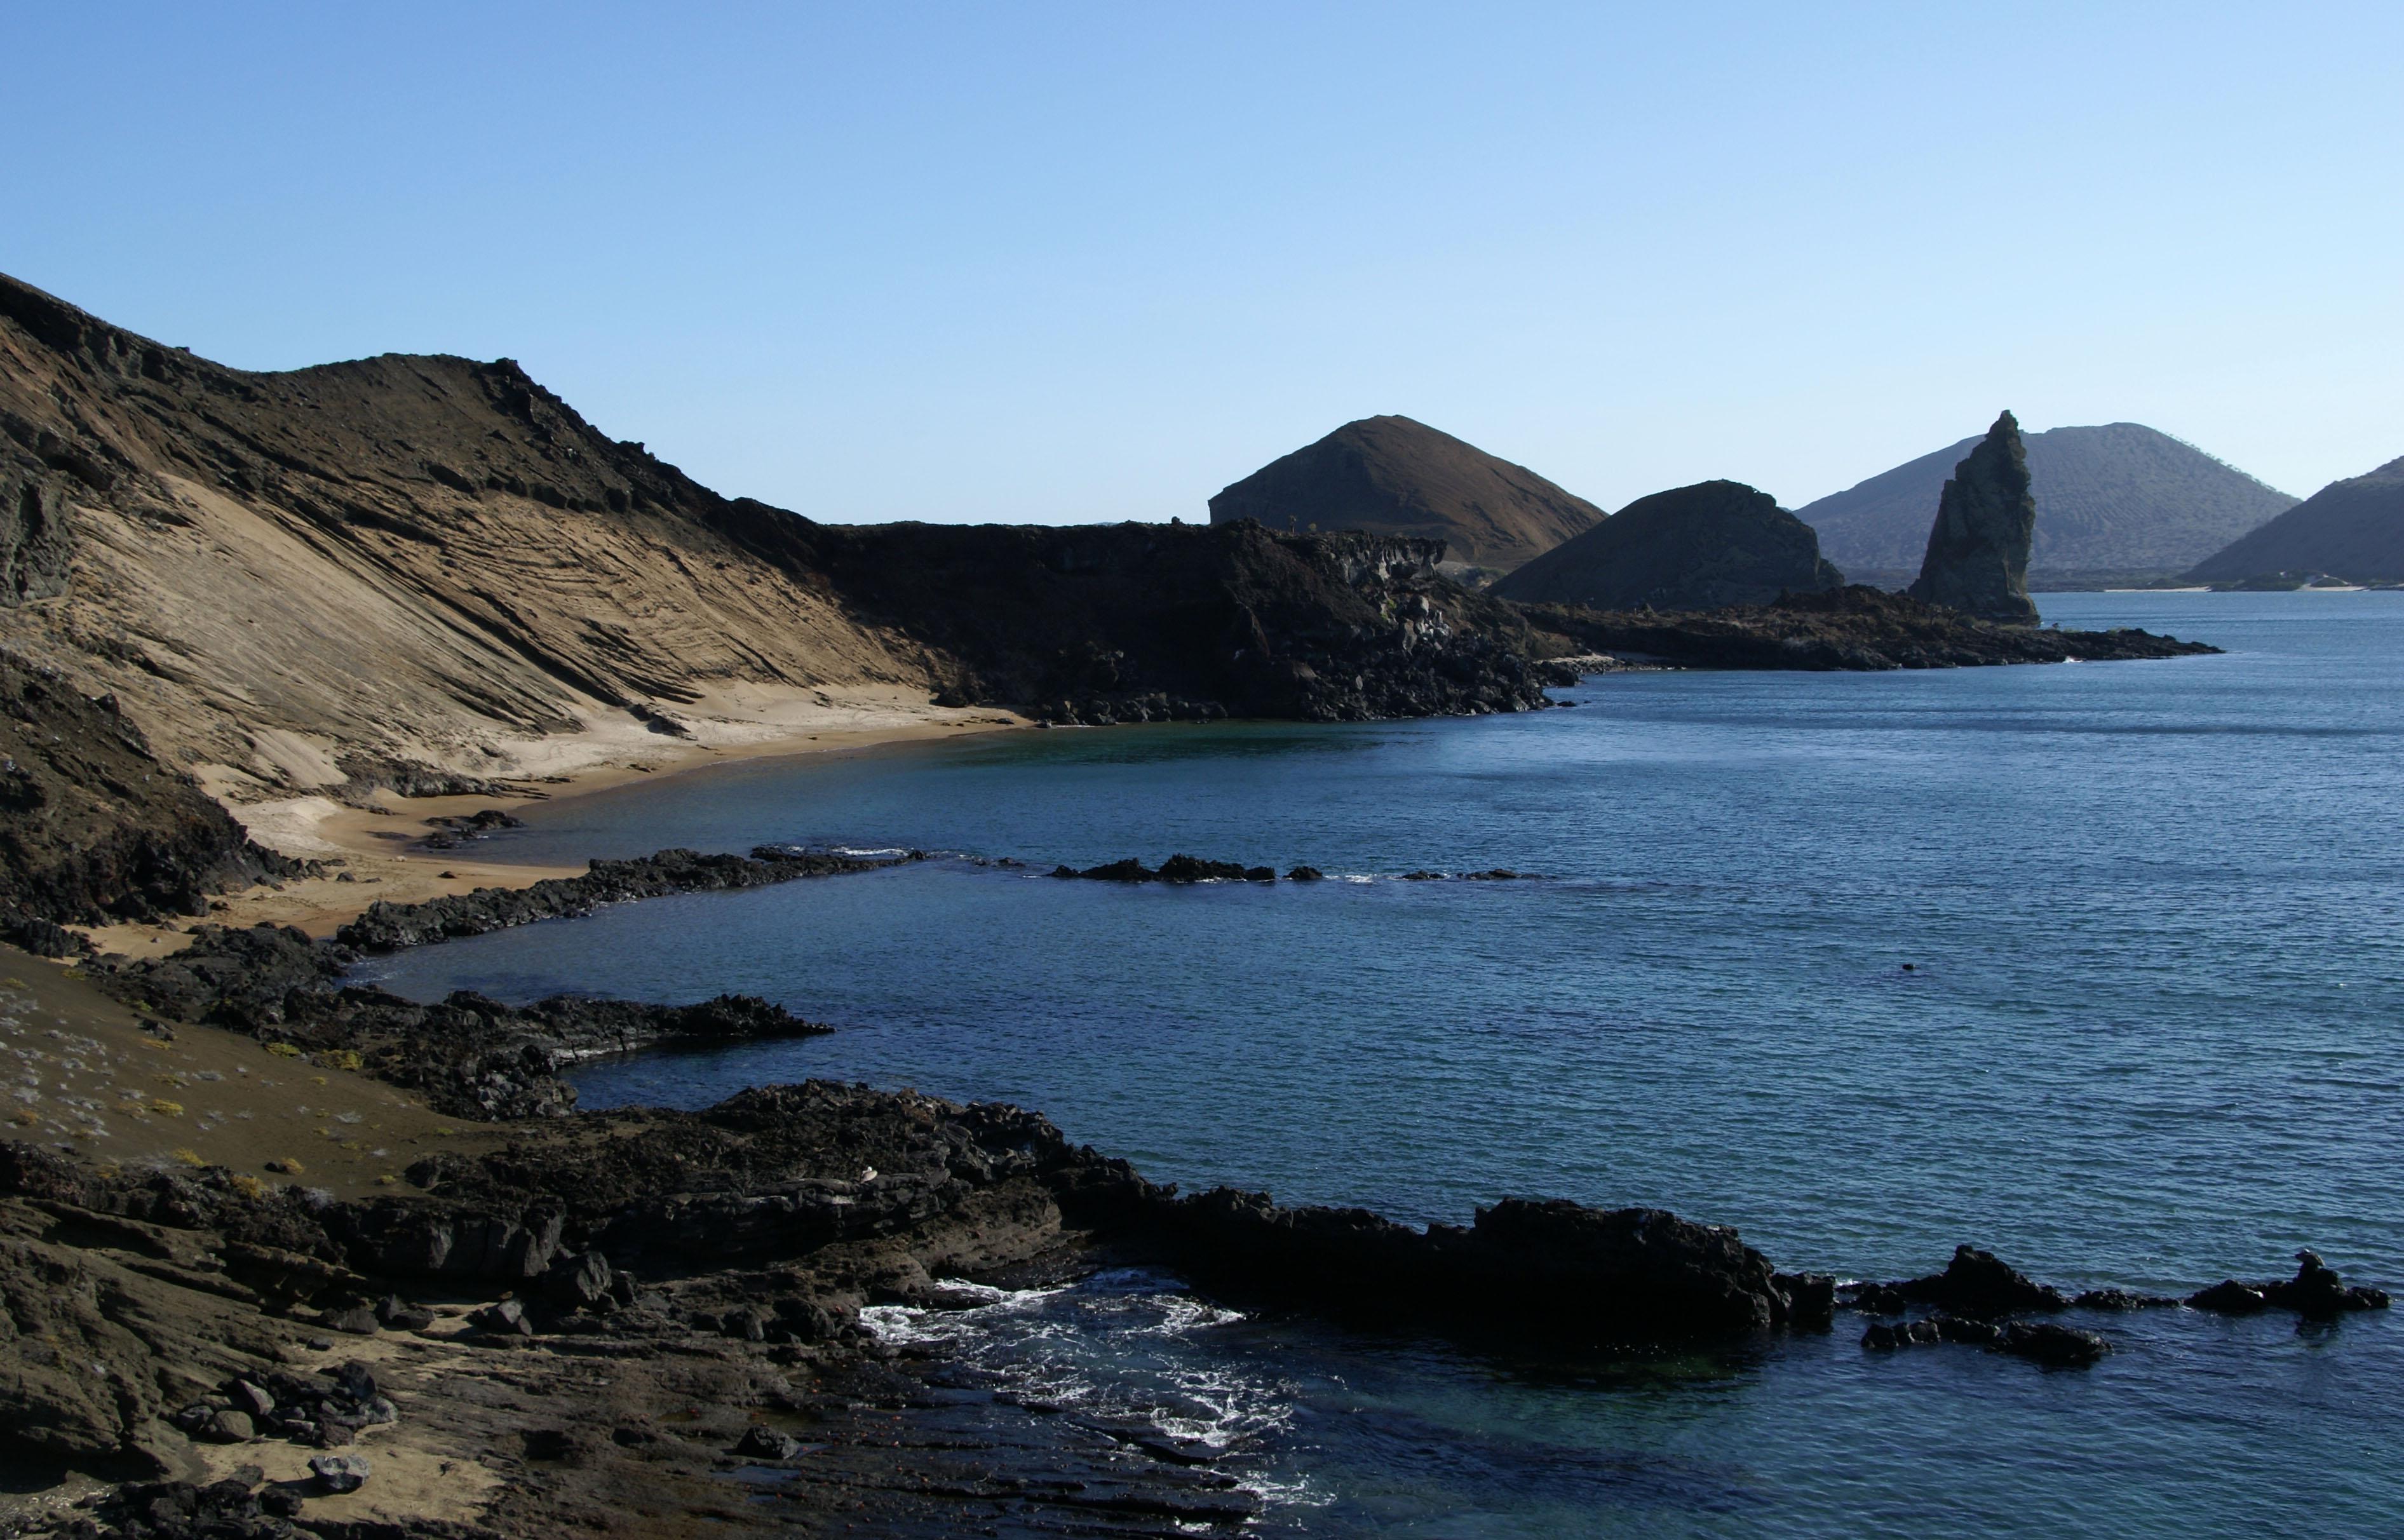 Bartolomé submarine crater